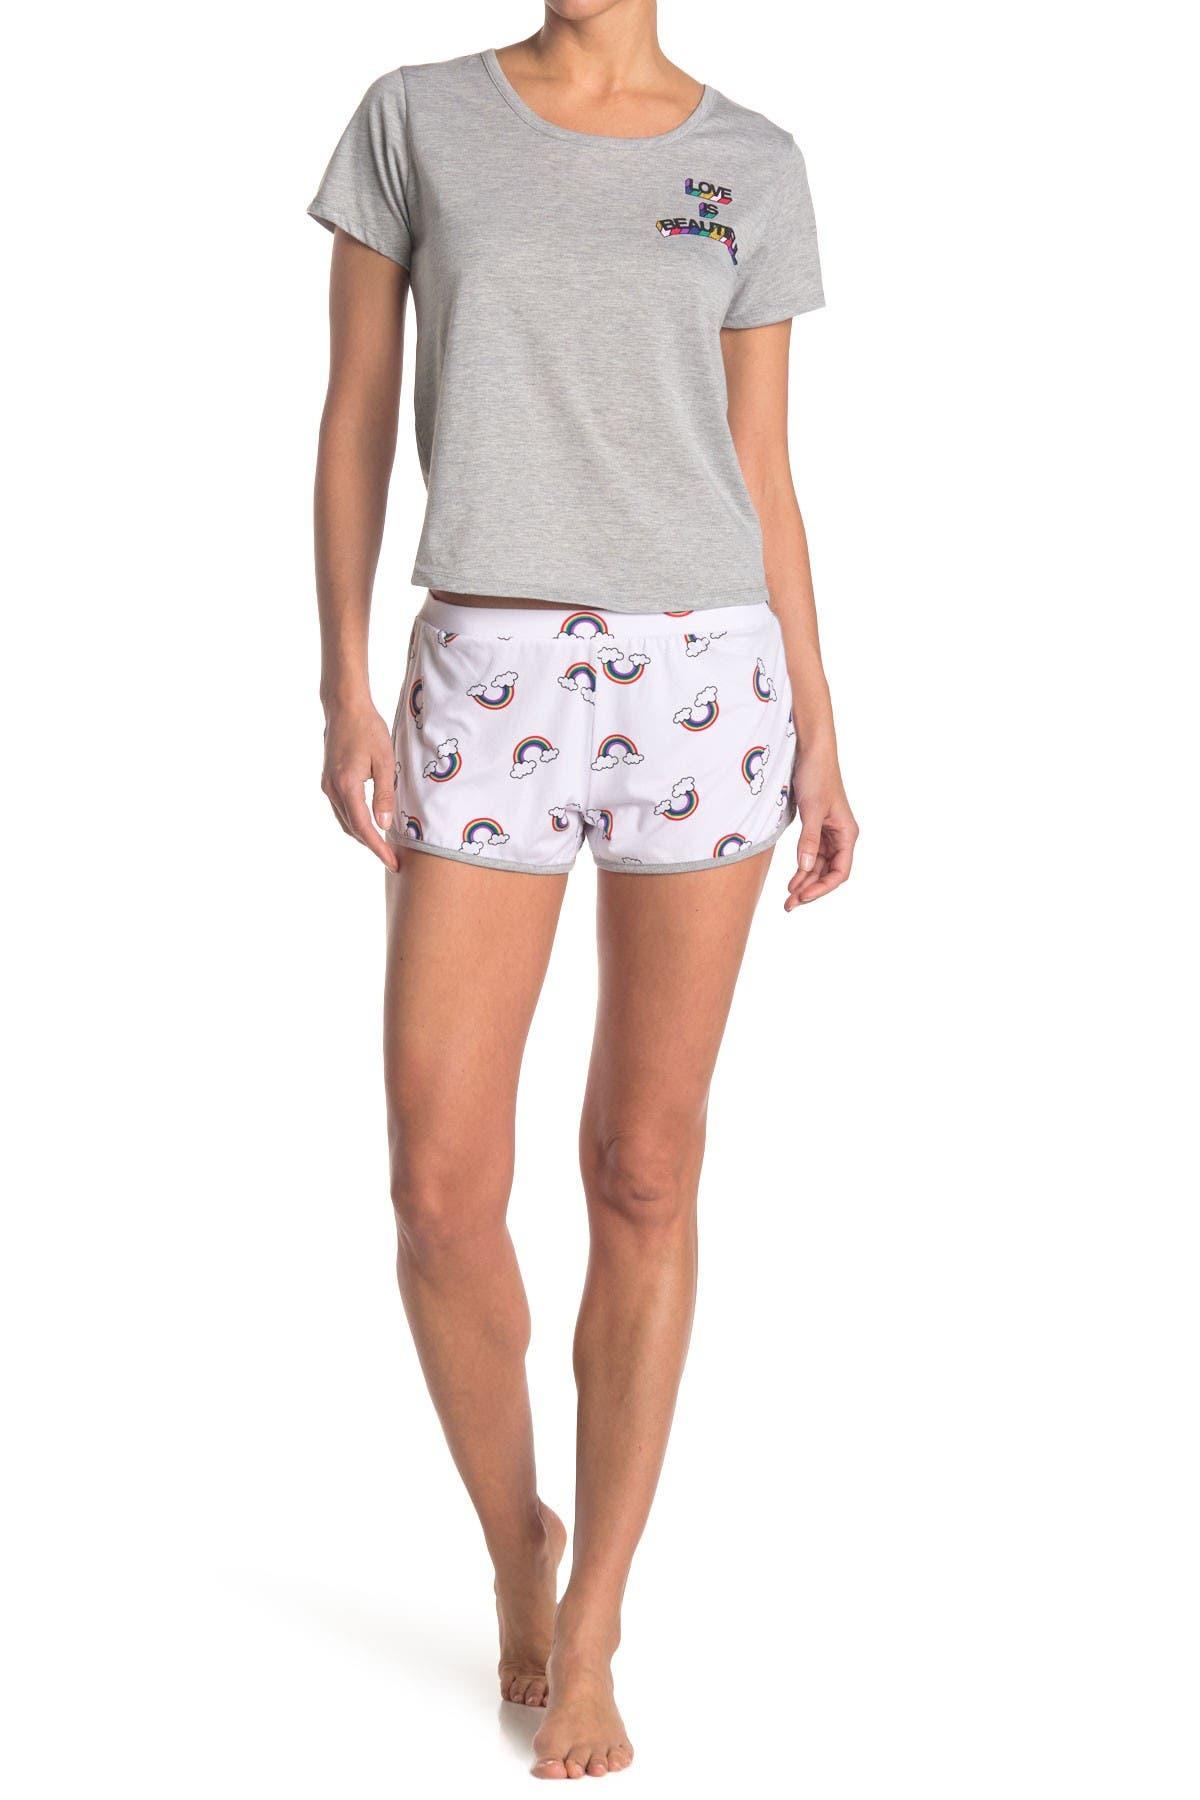 Image of PJ Couture Rainbow 2-Piece T-Shirt & Shorts PJ Set